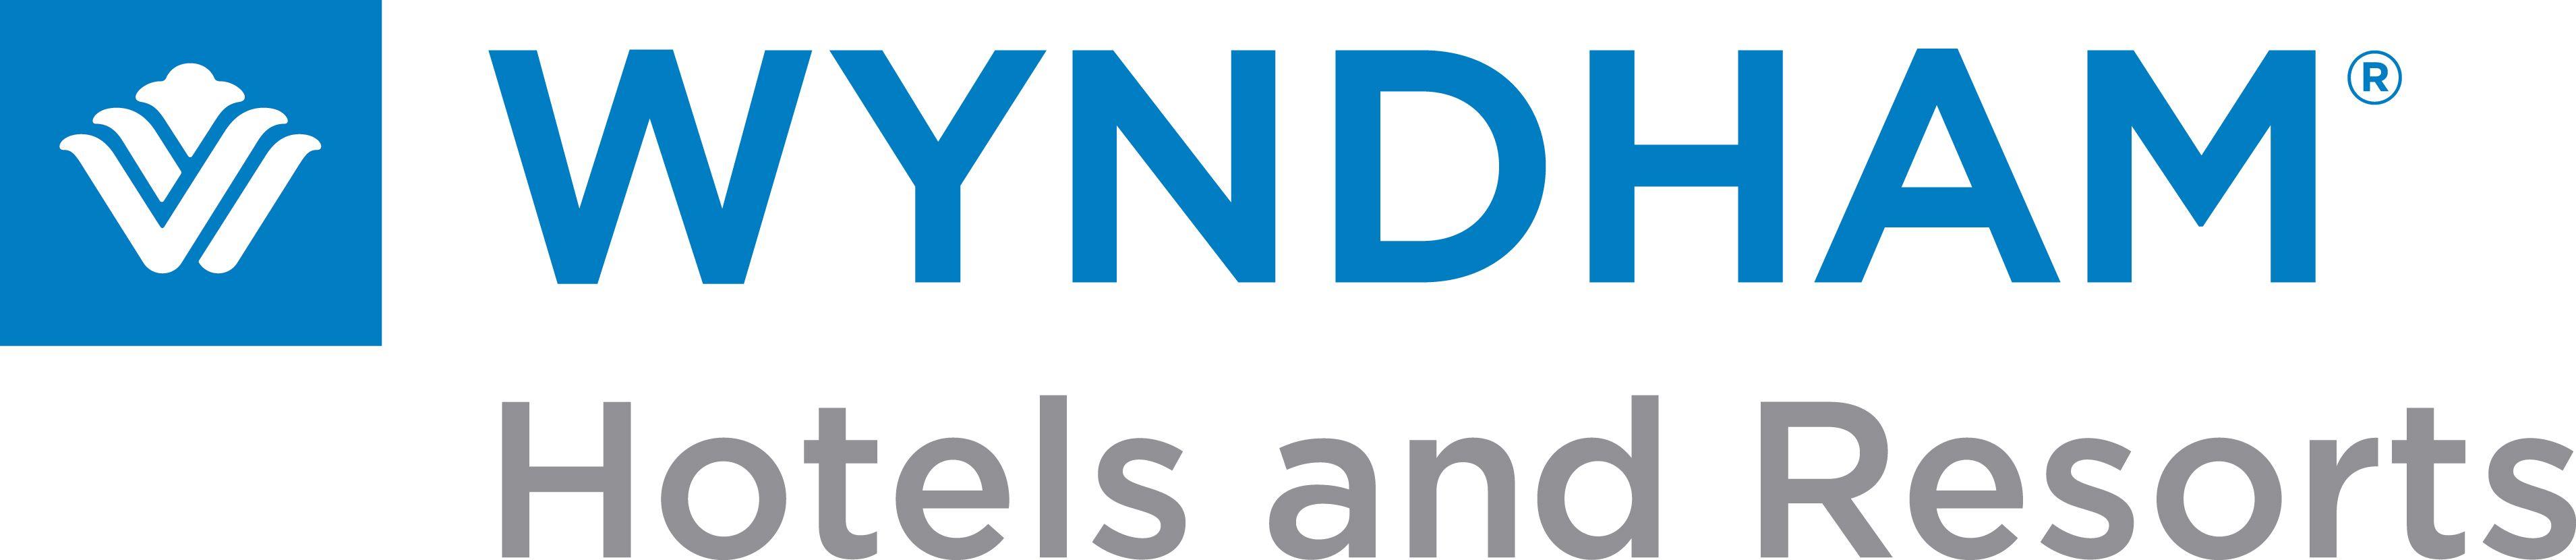 Wyndham Logo Resort logo